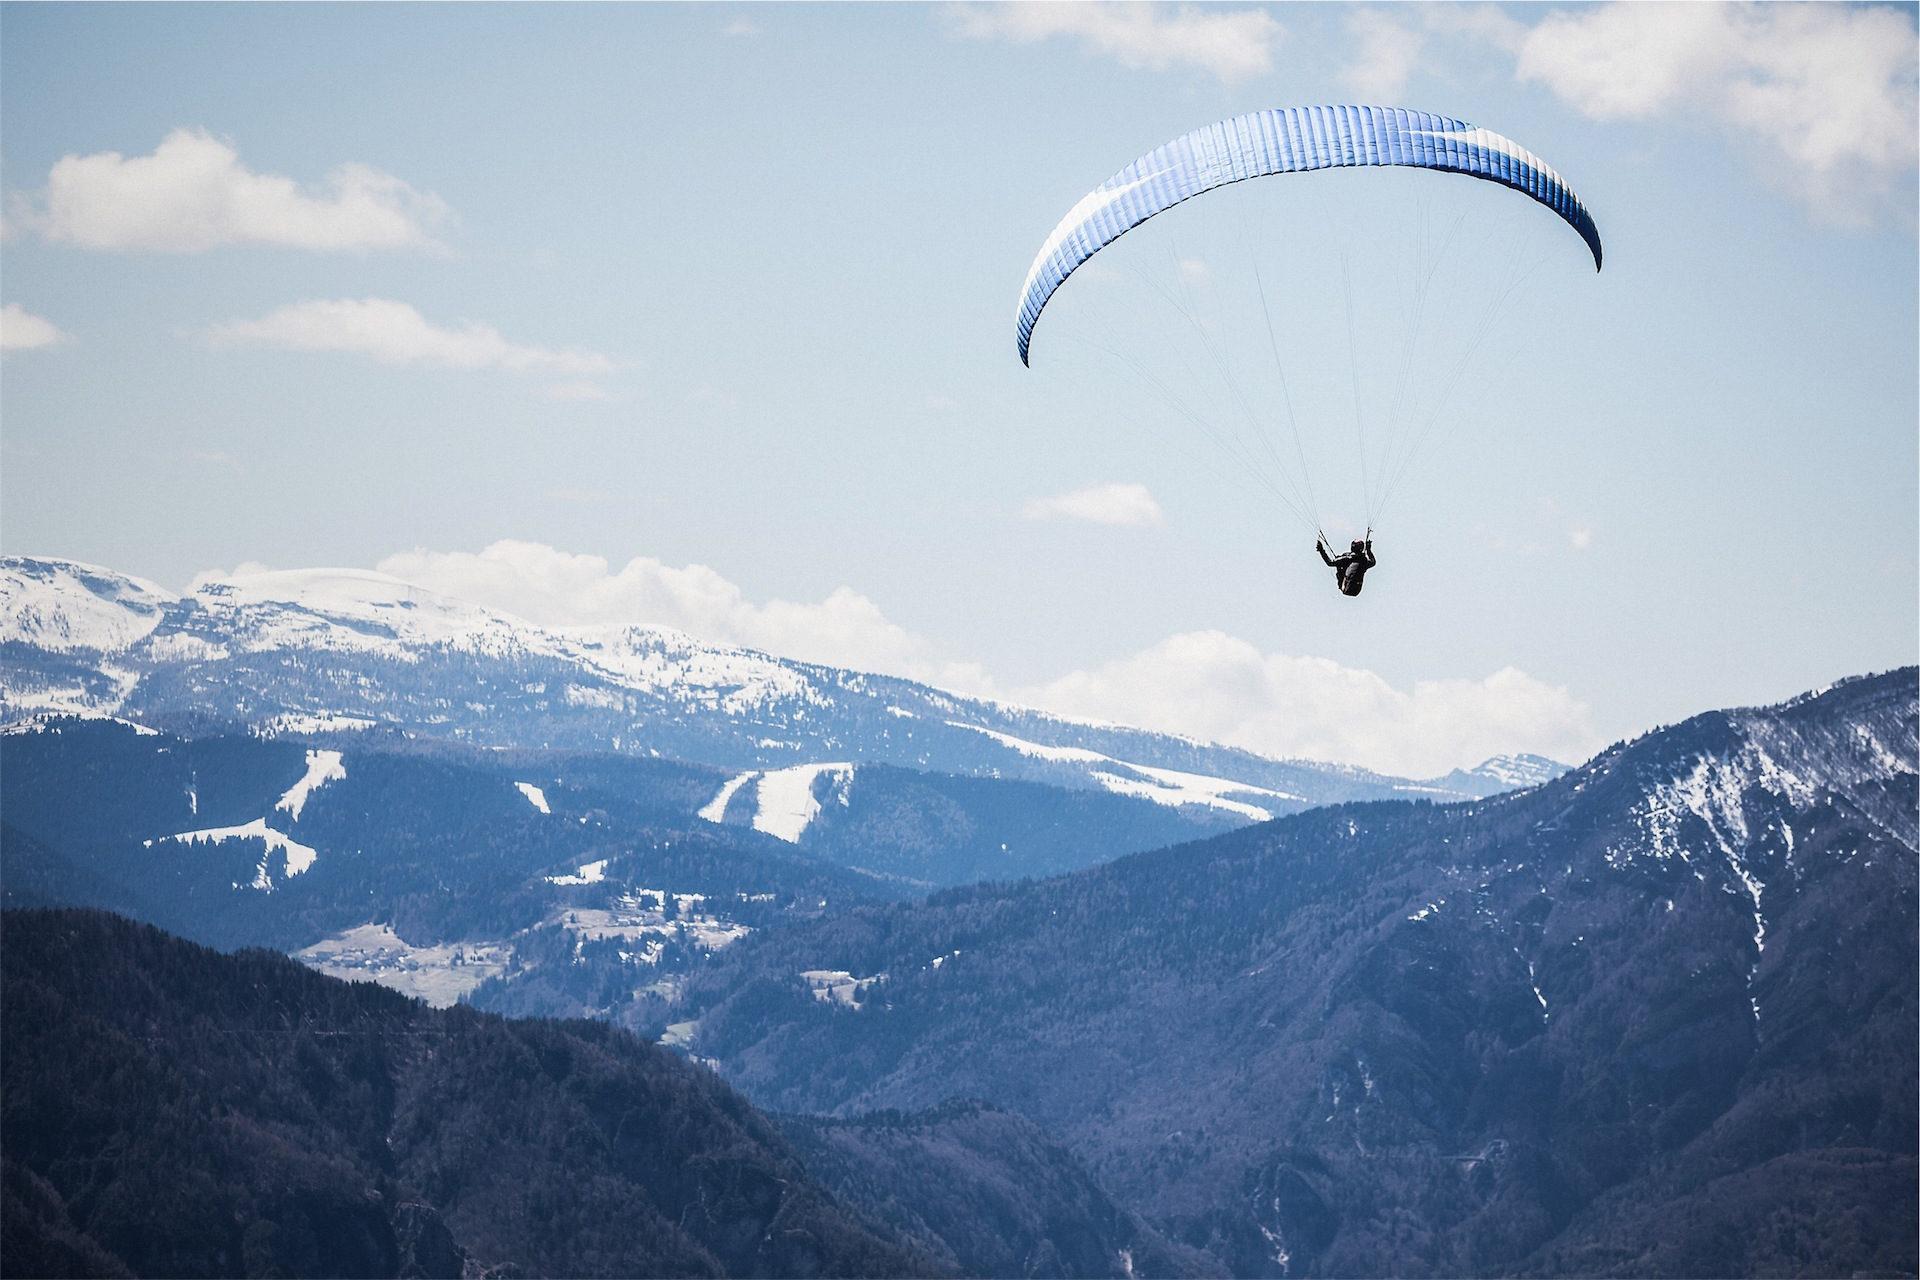 paracaidismo, パラシュート, 飛ぶ, 山, 空 - HD の壁紙 - 教授-falken.com